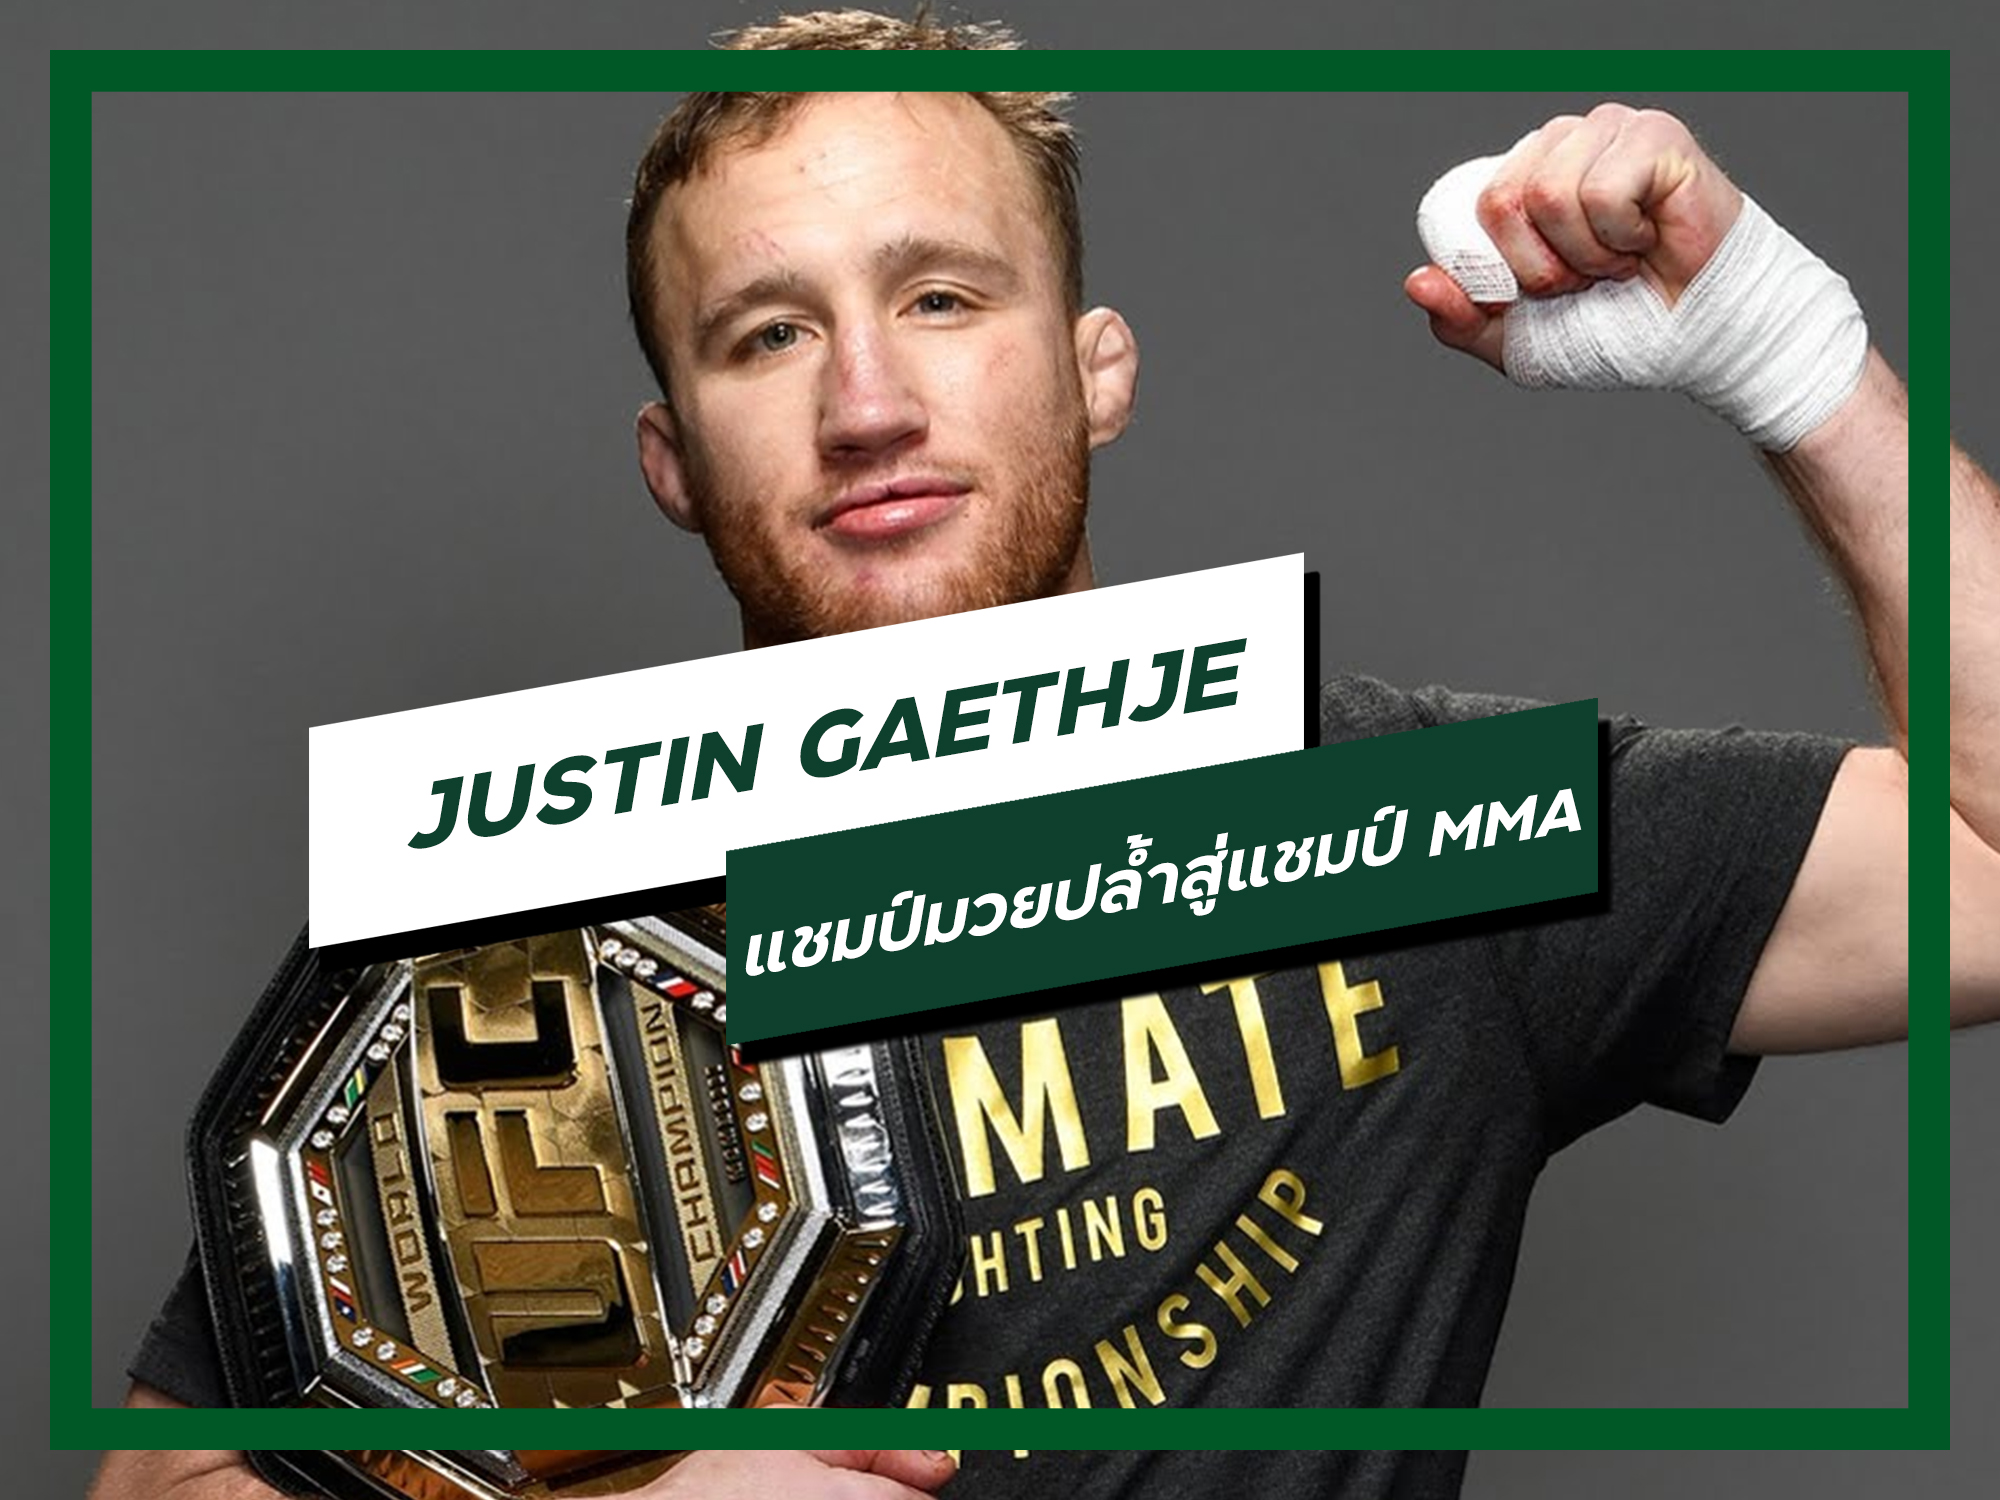 JUSTIN GAETHJE แชมป์มวยปล้ำสู่แชมป์ MMA